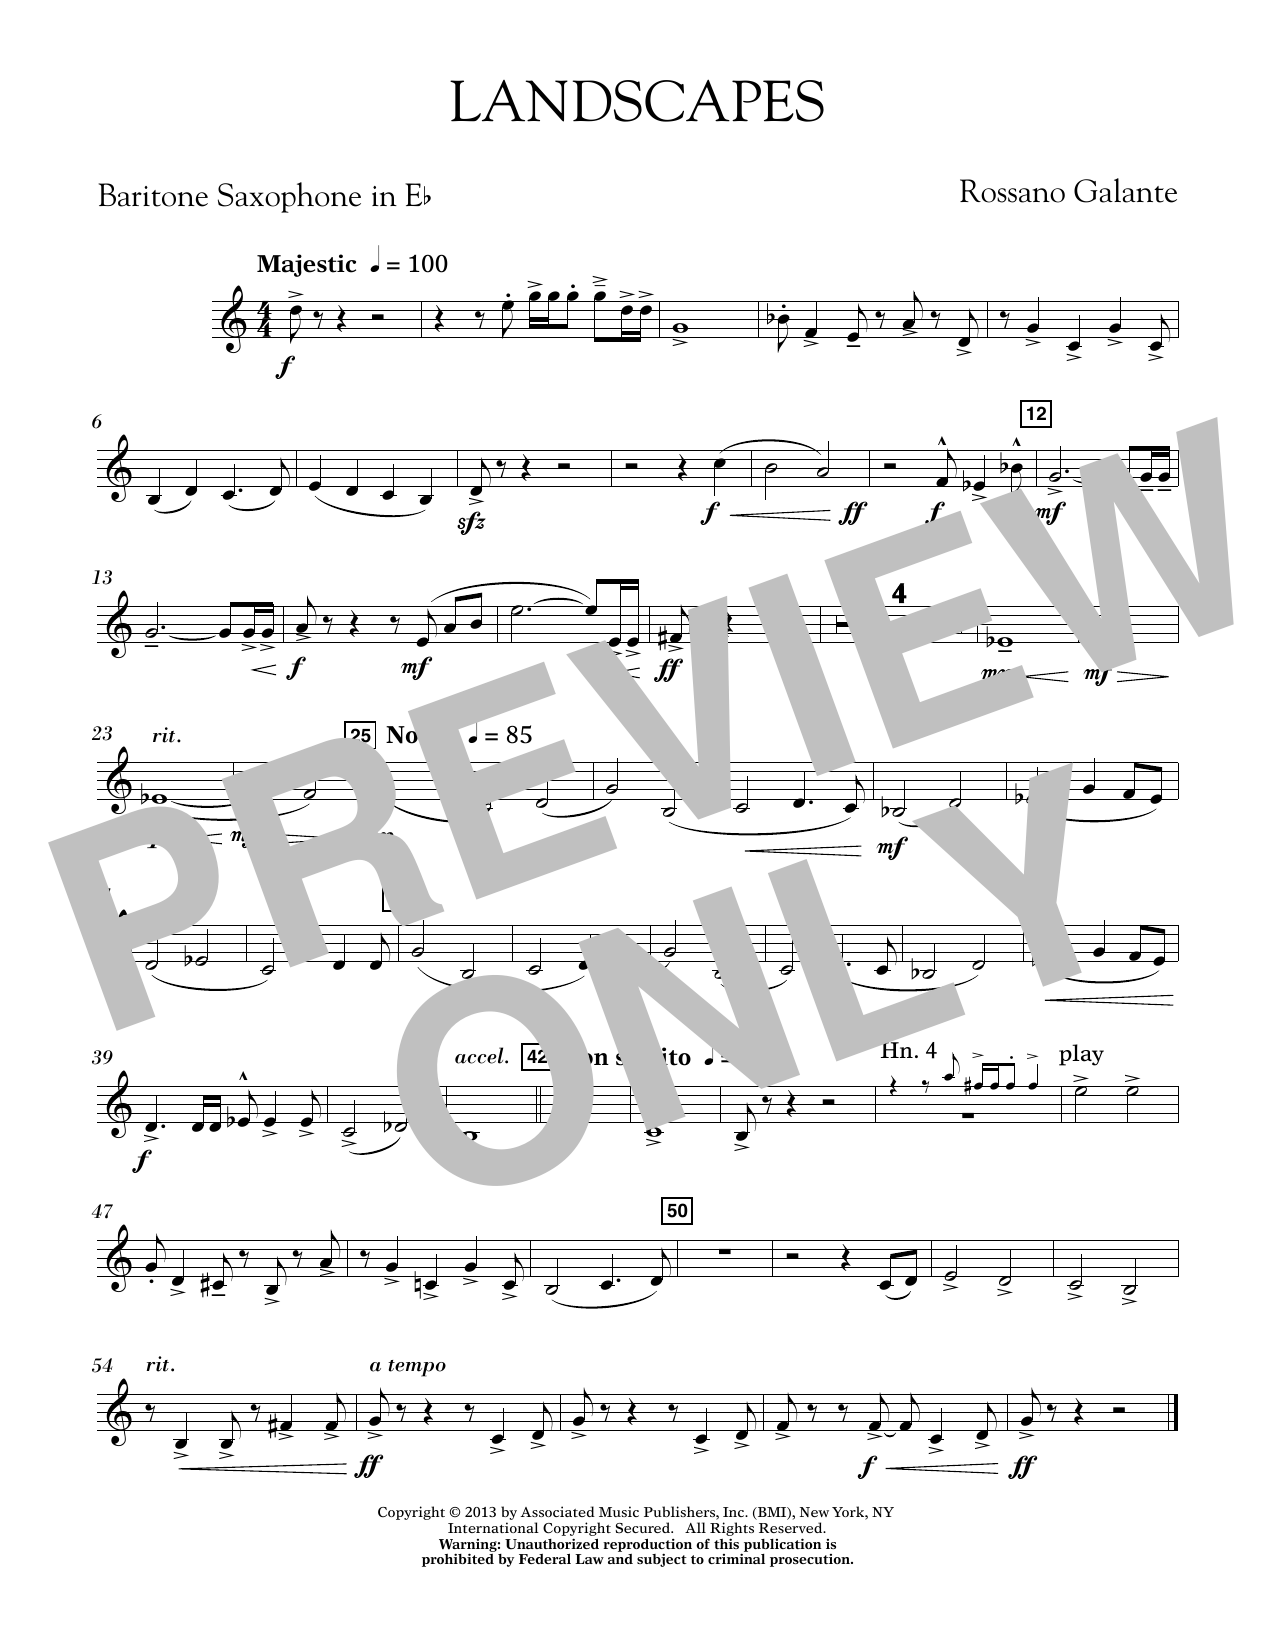 Rosanno Galante Landscapes - Eb Baritone Saxophone sheet music notes printable PDF score